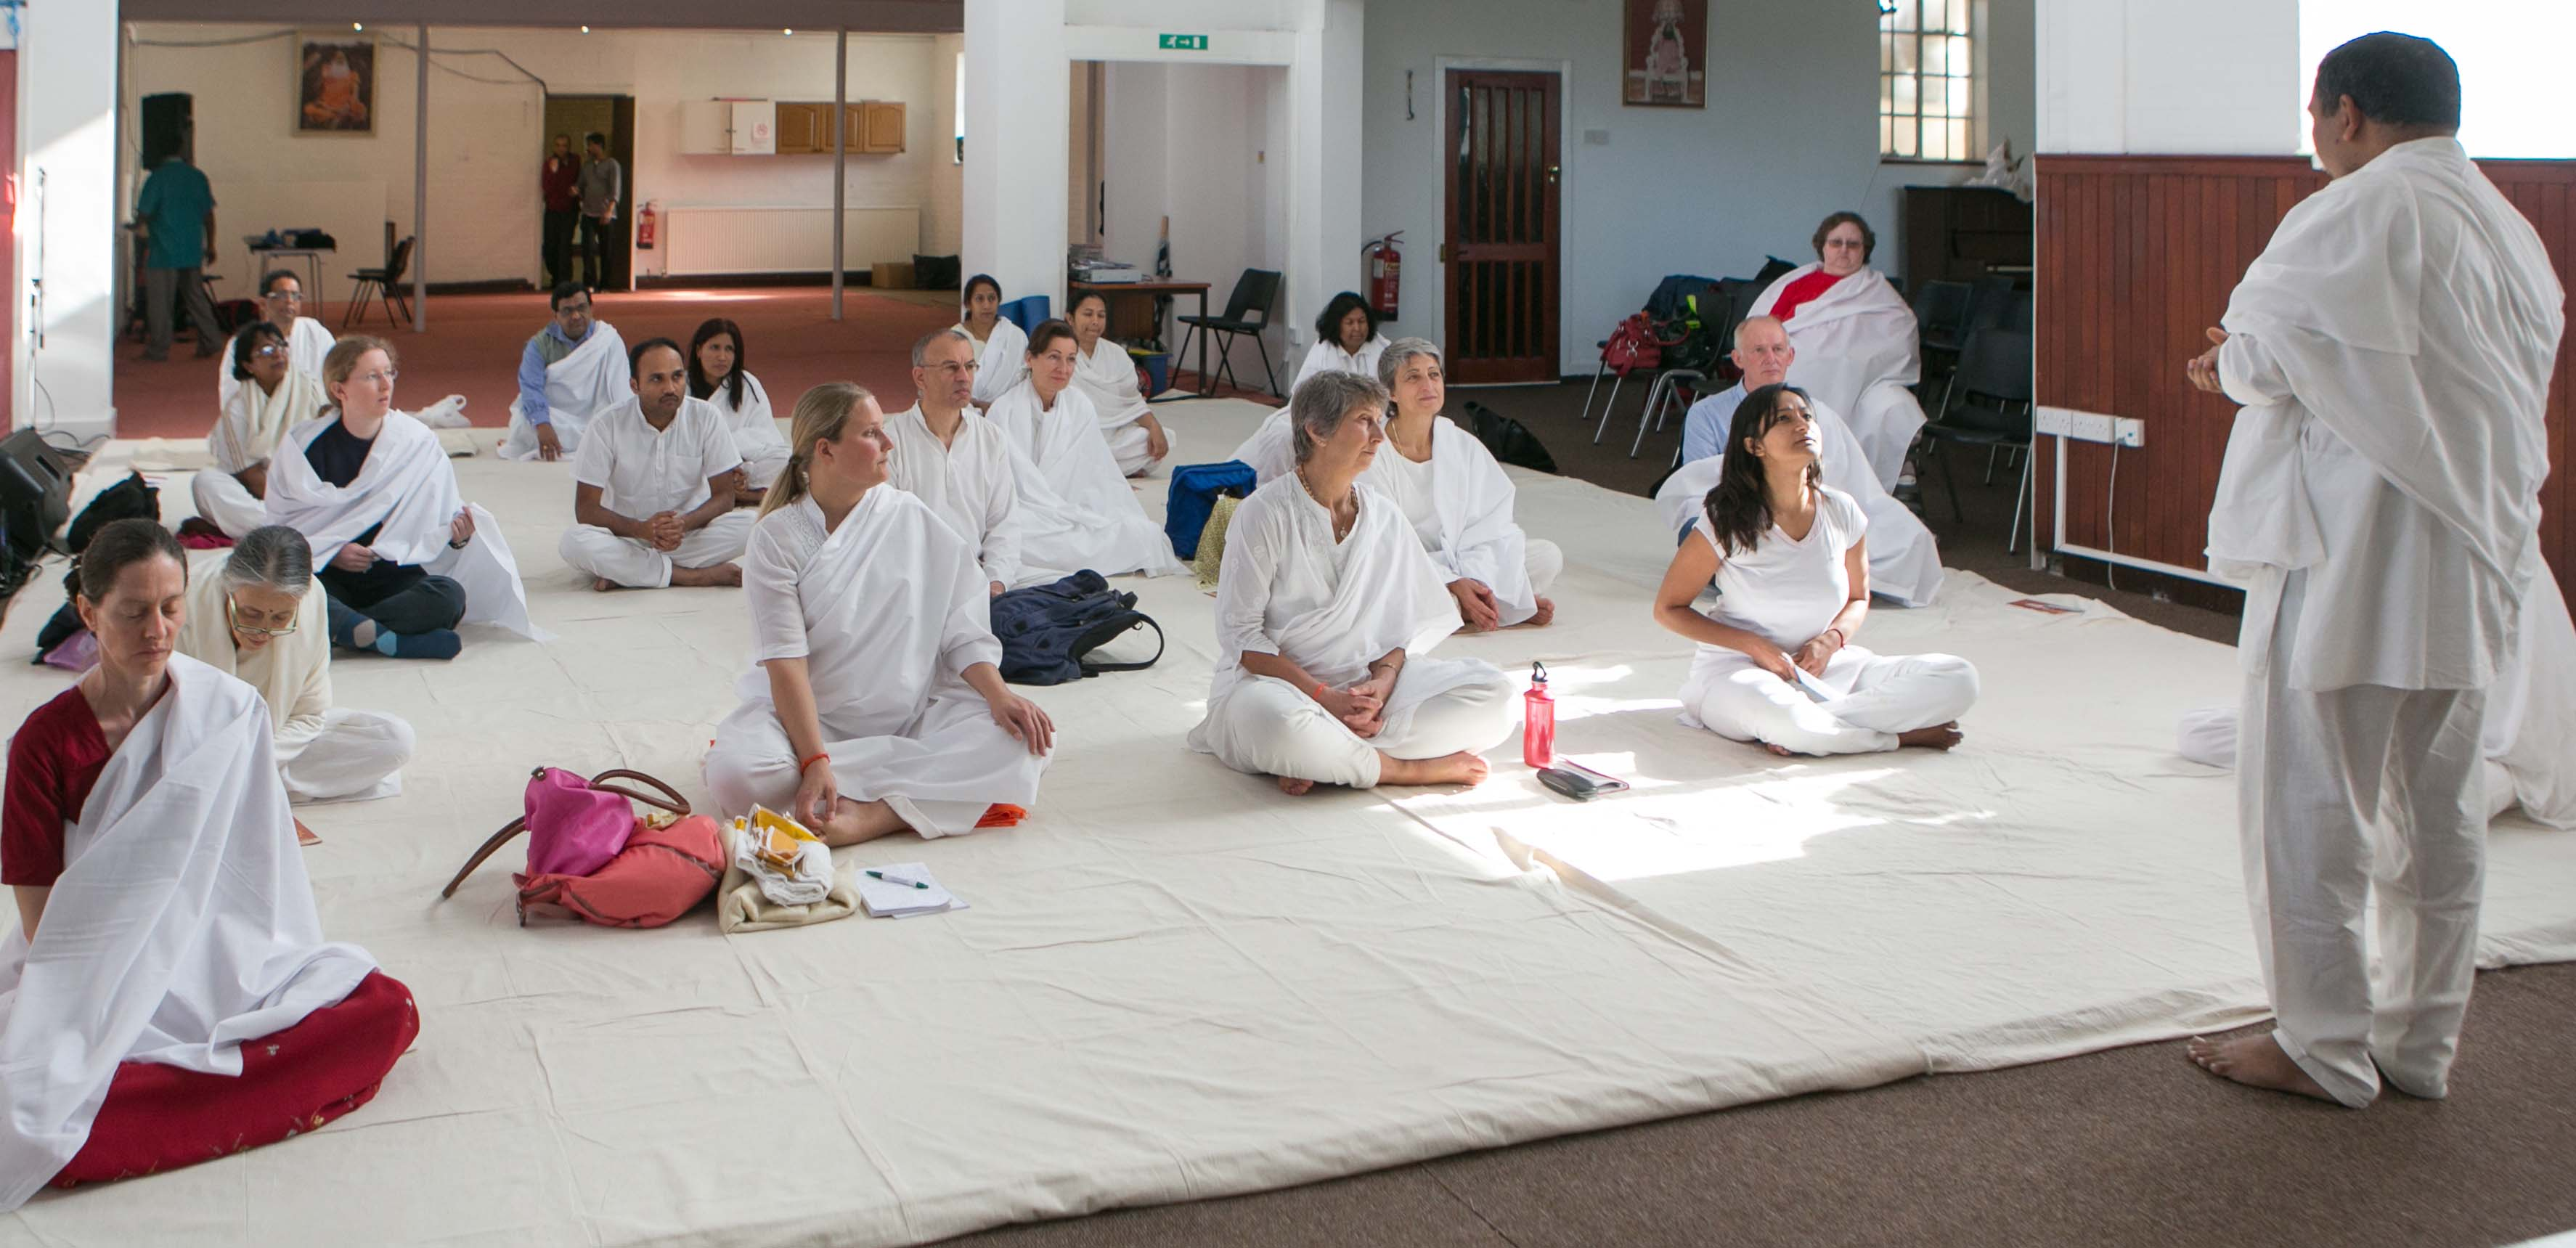 How do I practice meditation safely? 4